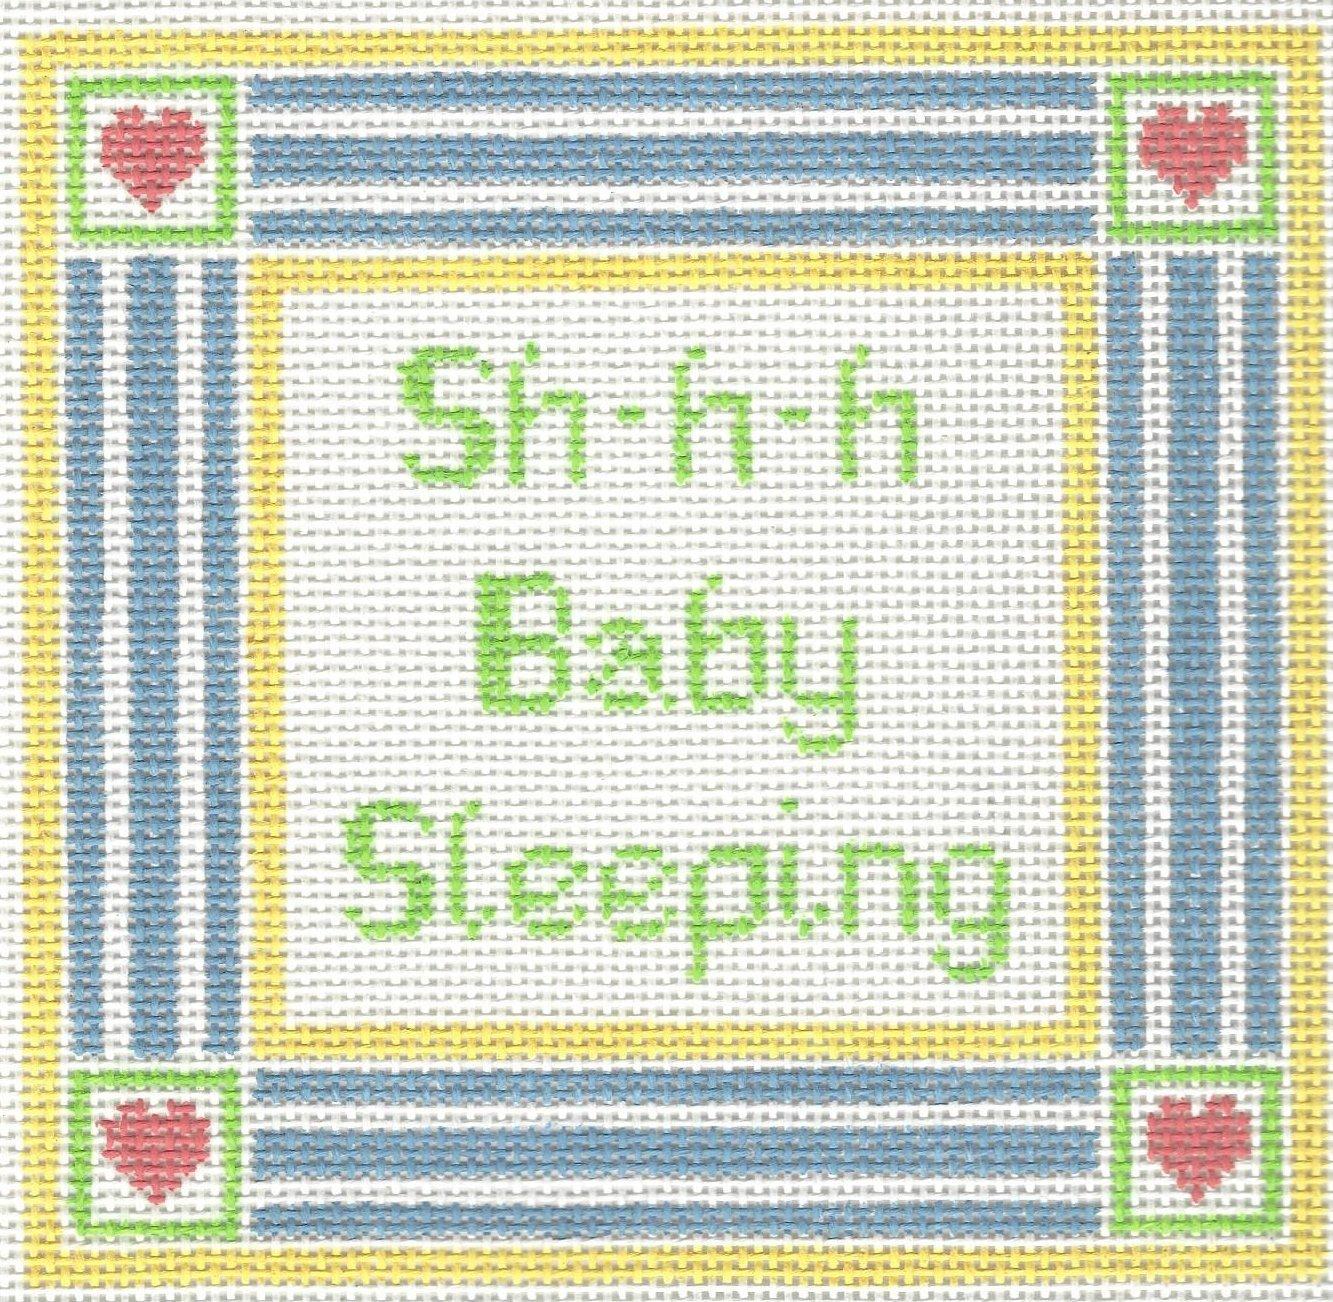 Baby Sleeping Stripes & Hearts